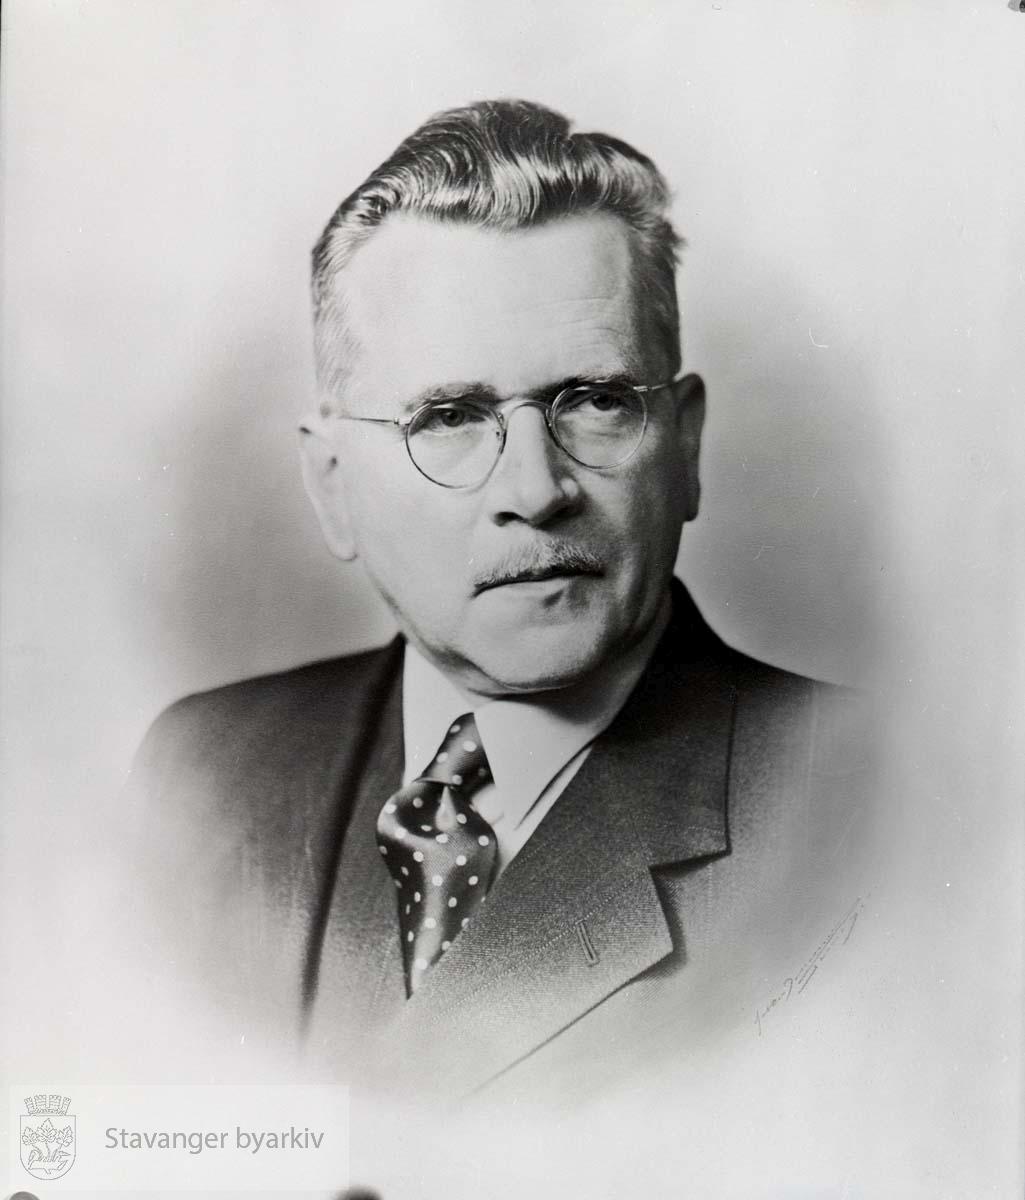 Ordfører i Stavanger 1946. Arbeiderpartiet..Finansrådmann 1947-1957..Paraplymaker.